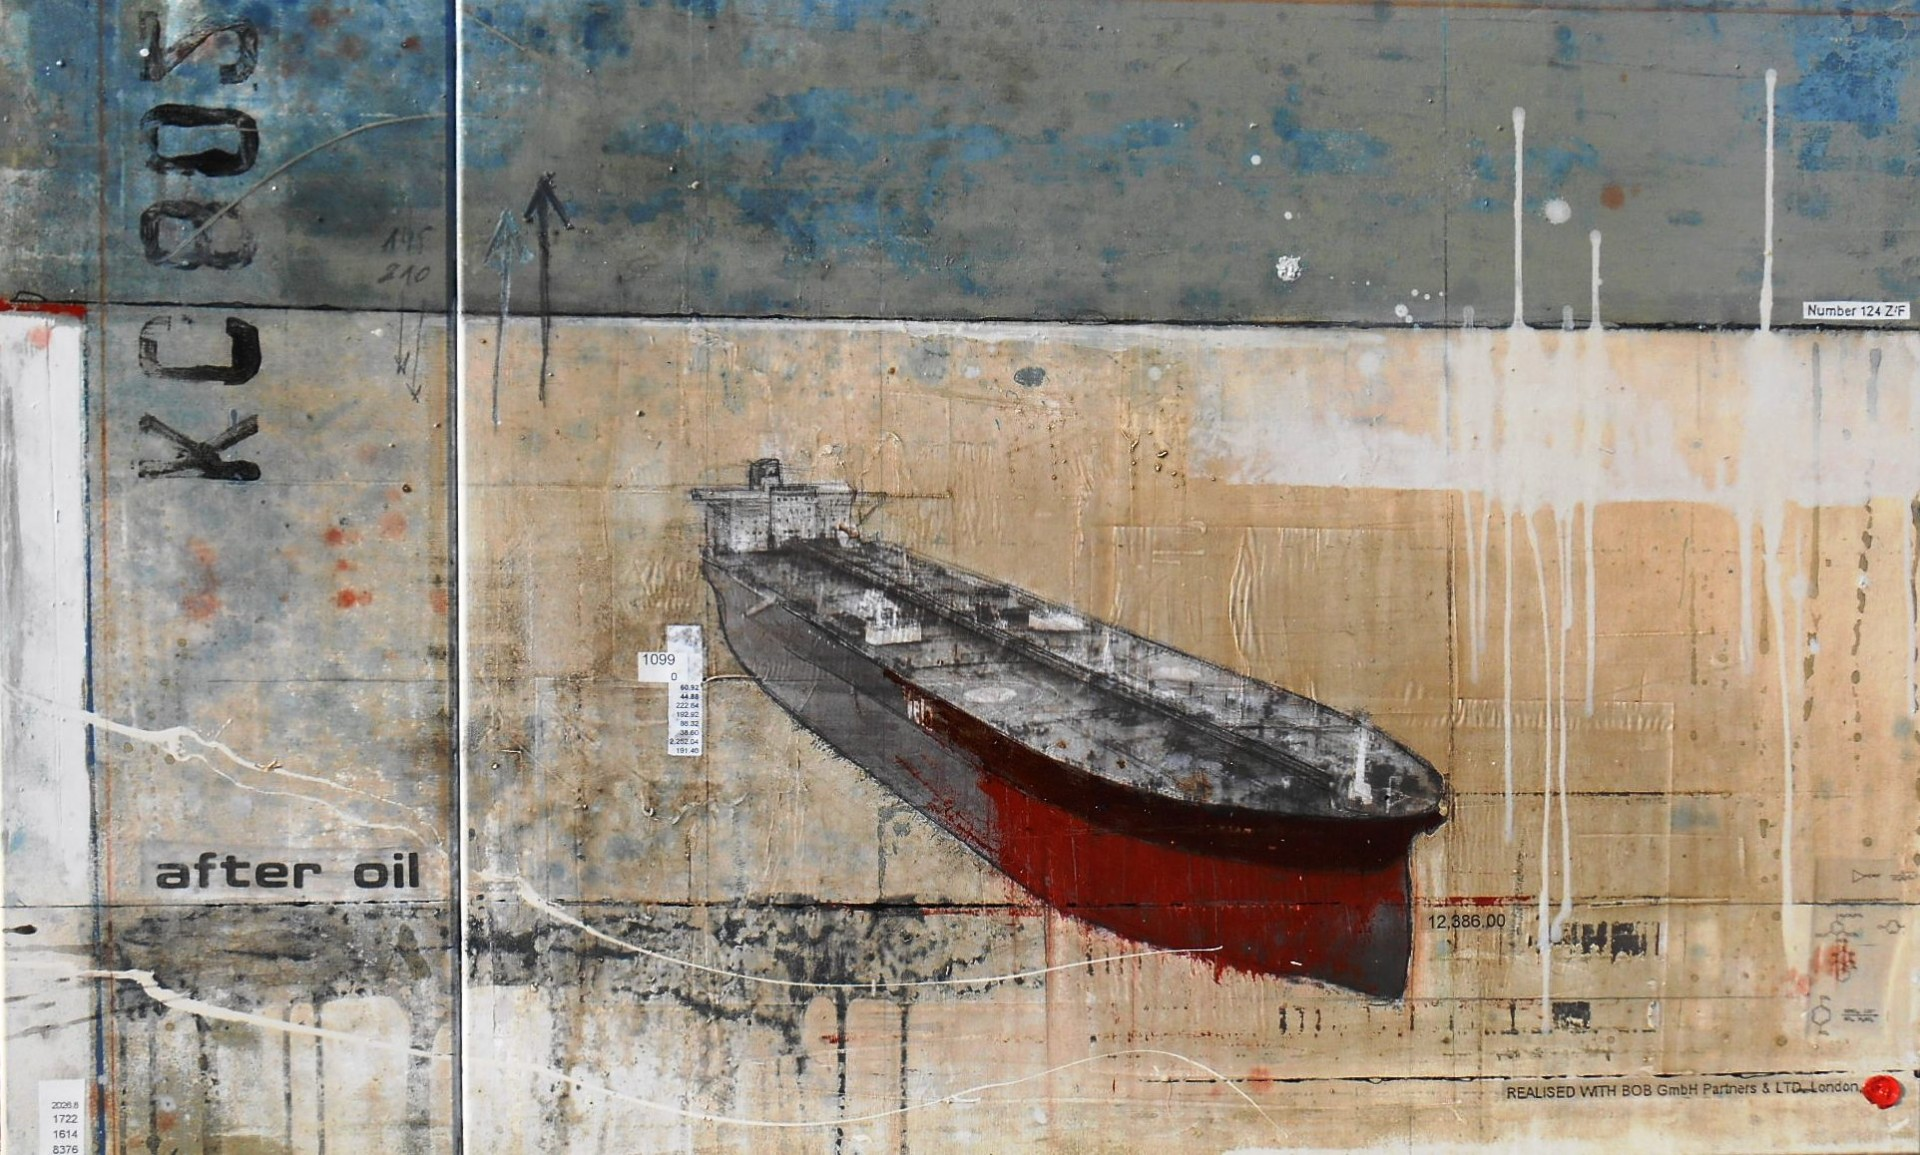 After Oil - Tankers Armada - collage photo, huile, acrylique sur toile - 80 x 160 cm - 2014